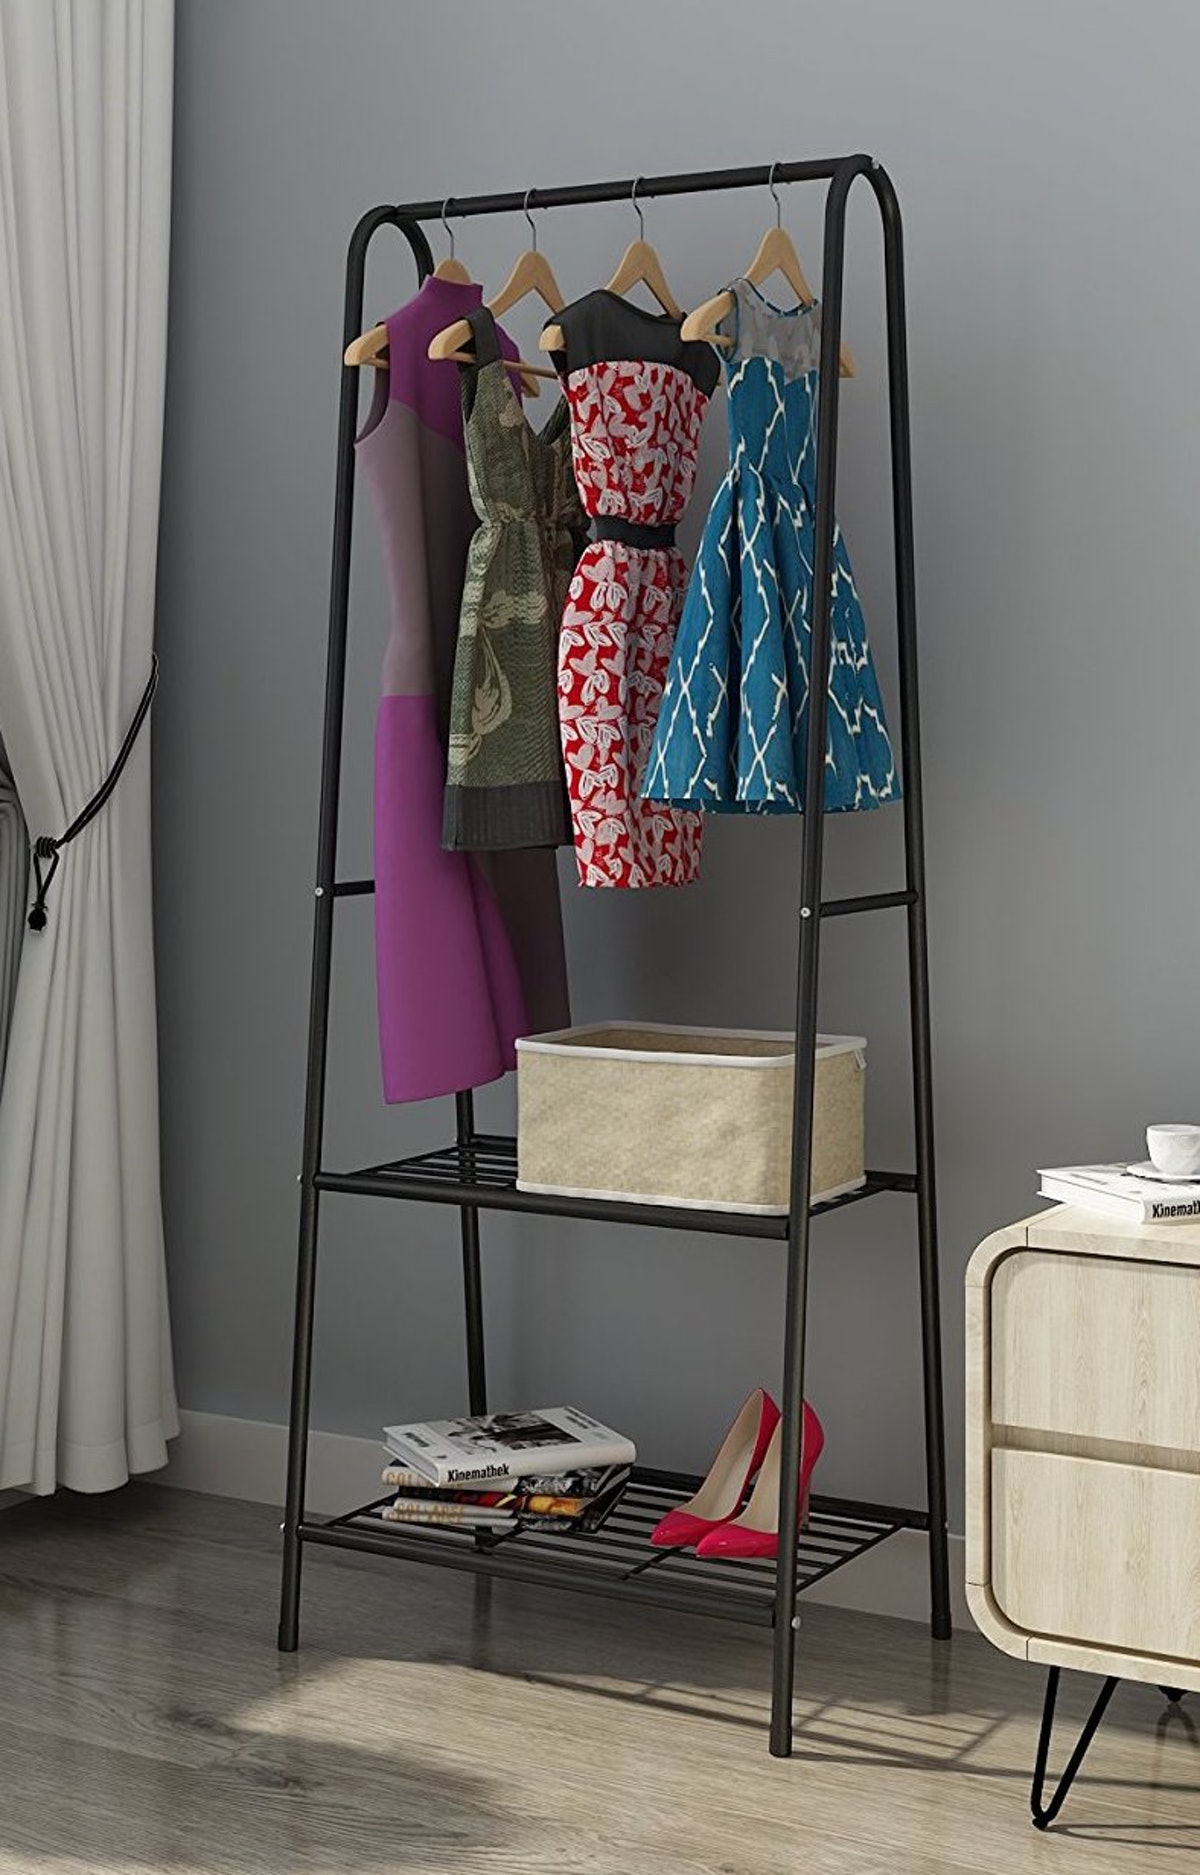 MULSH Clothing Garment Rack